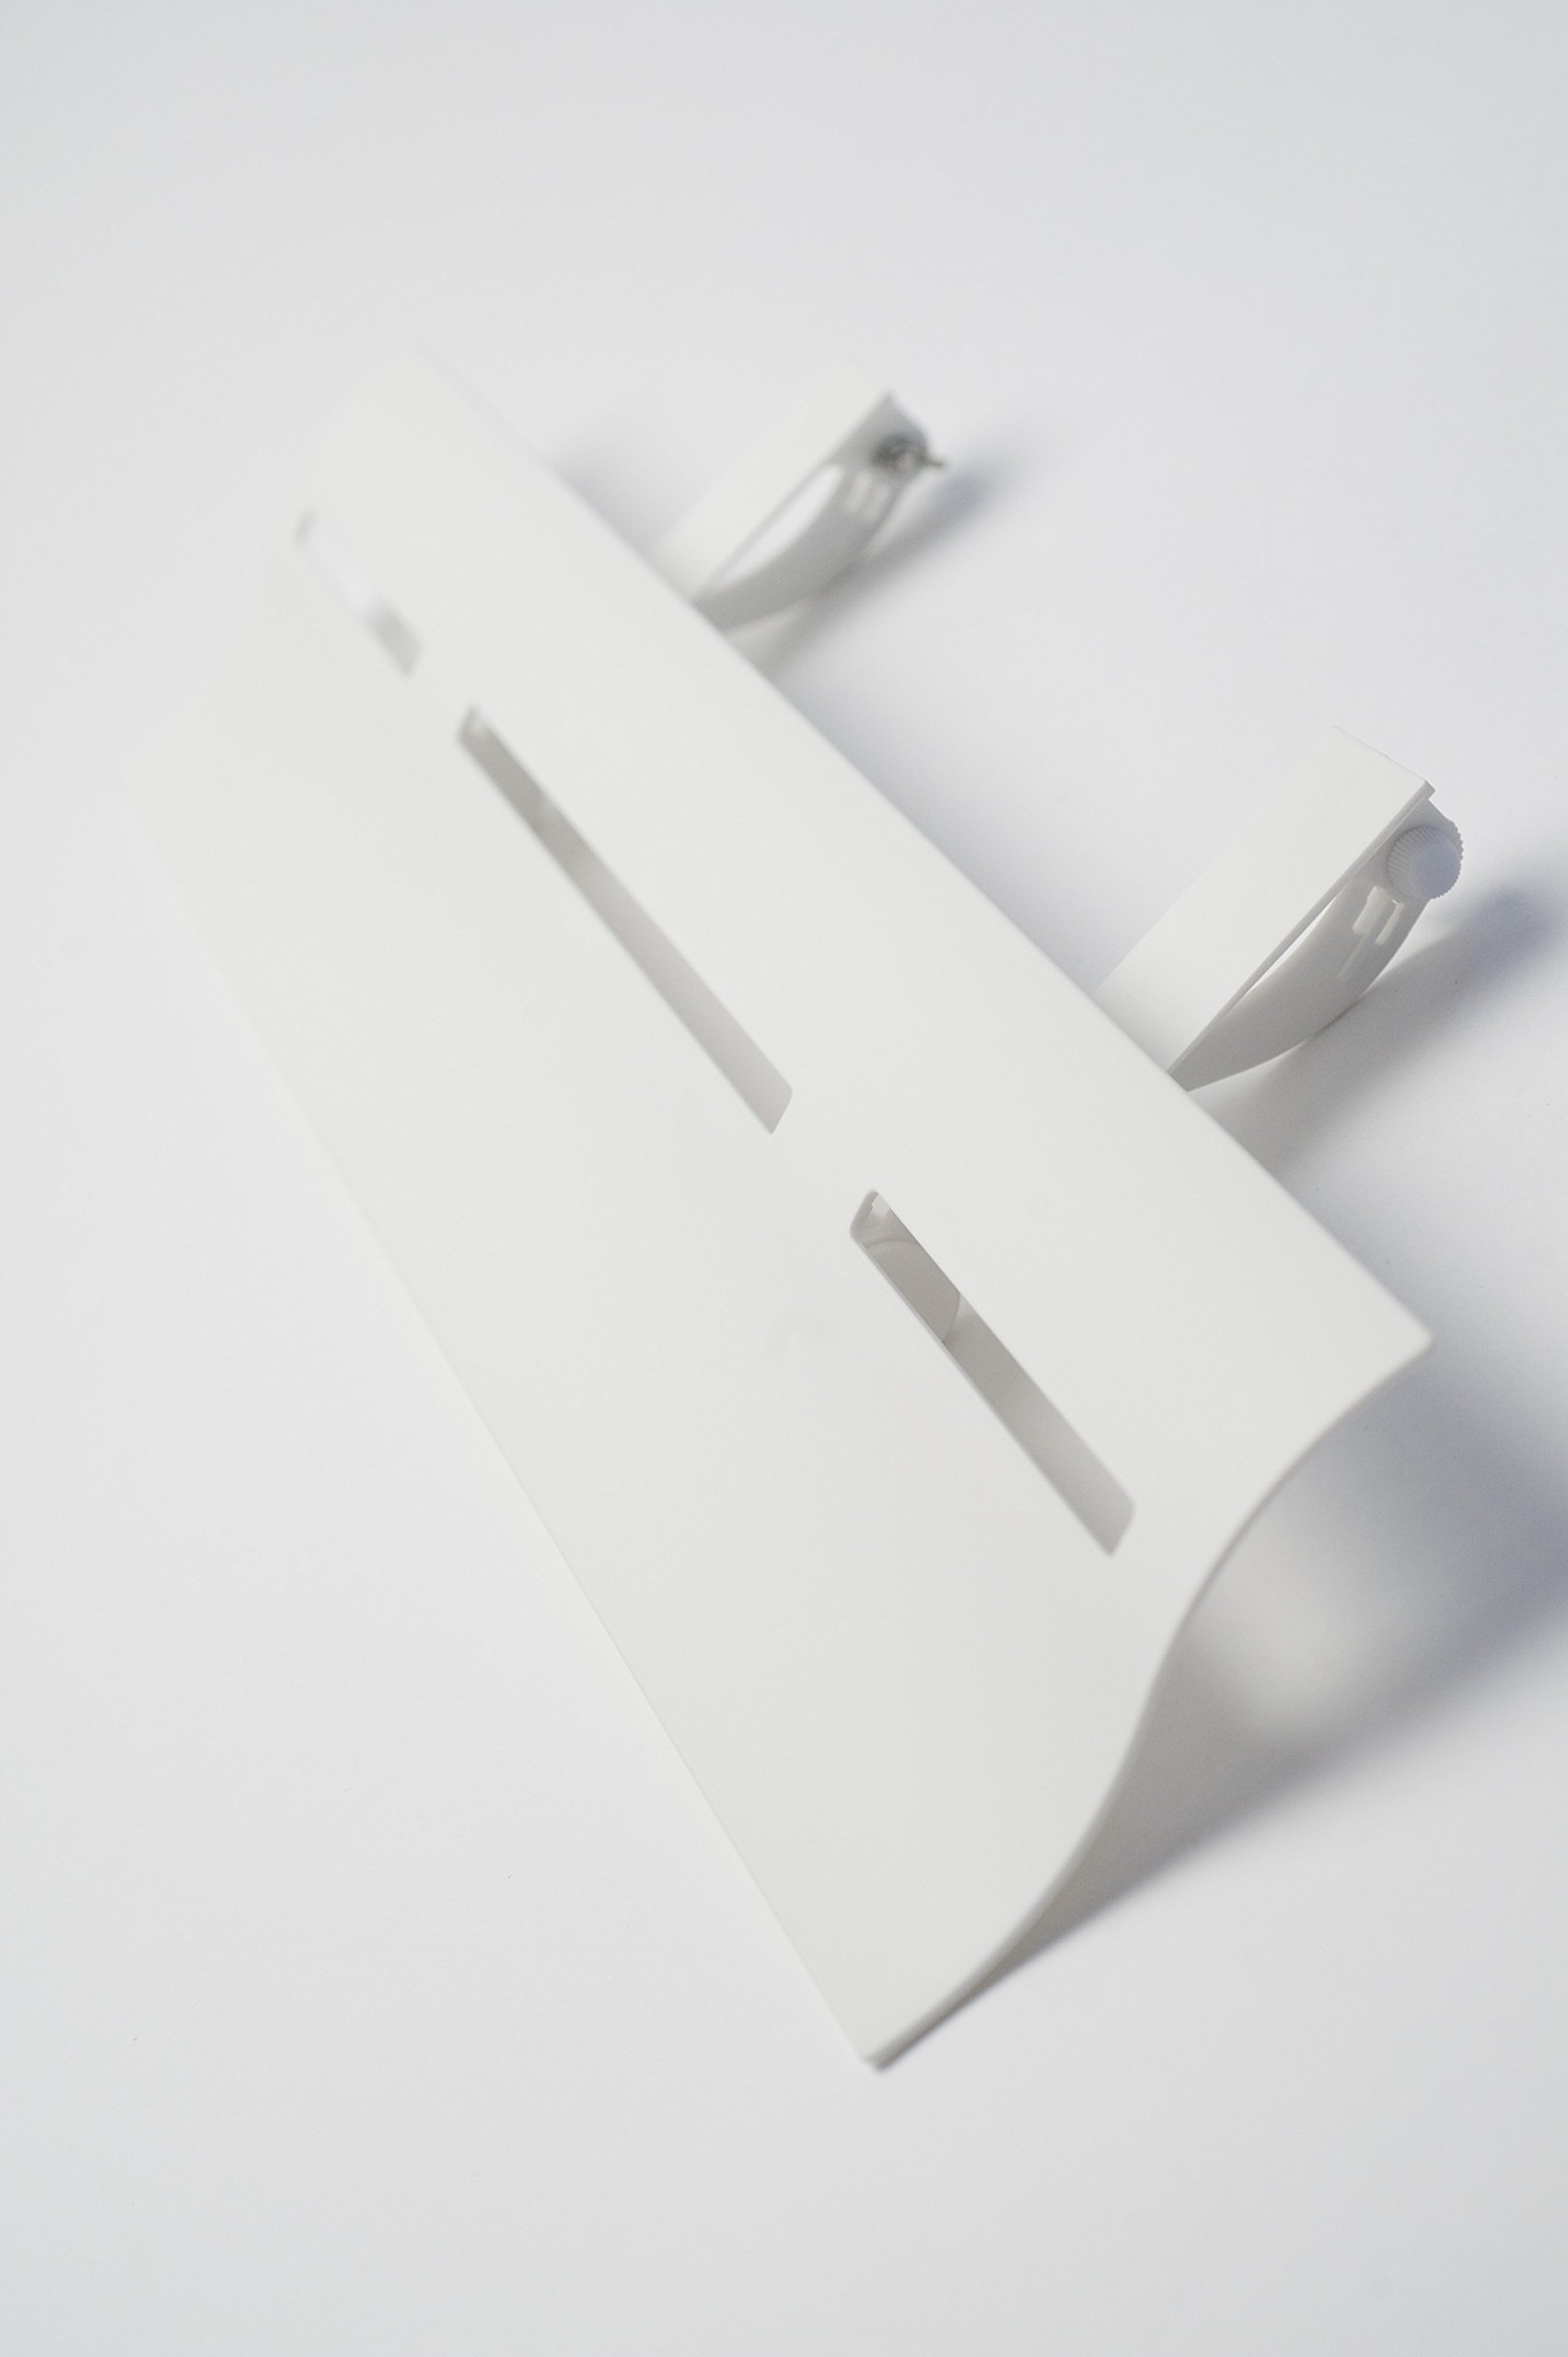 Air conditioner deflector AIR WING Kaze-Yoke, stylish, energy saving, made in japan